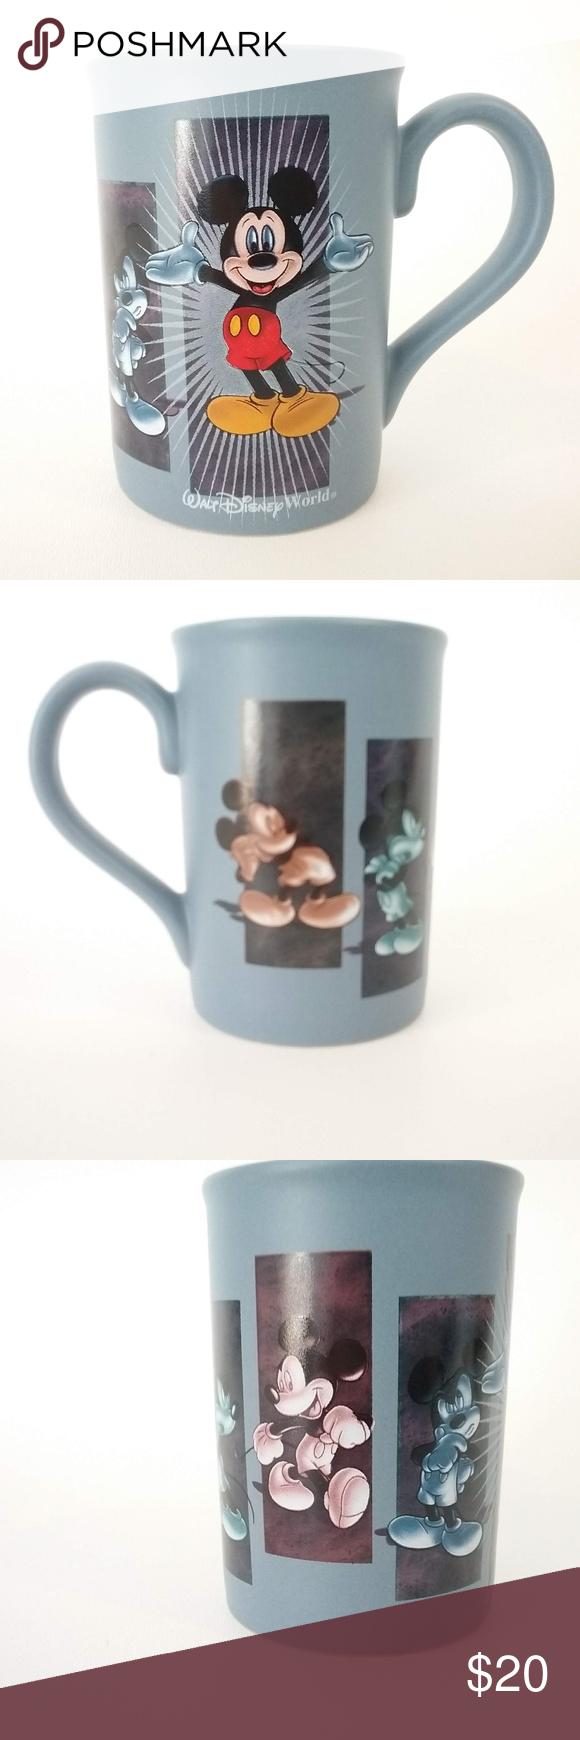 Walt Disney World Mickey Mouse Coffee Mug Blue Very good used condition. Slight discoloration from coffee/tea in the bottom of the mug. Smoke free home. No crazing or cracks. Disney Dining Drinkware #disneycoffeemugs